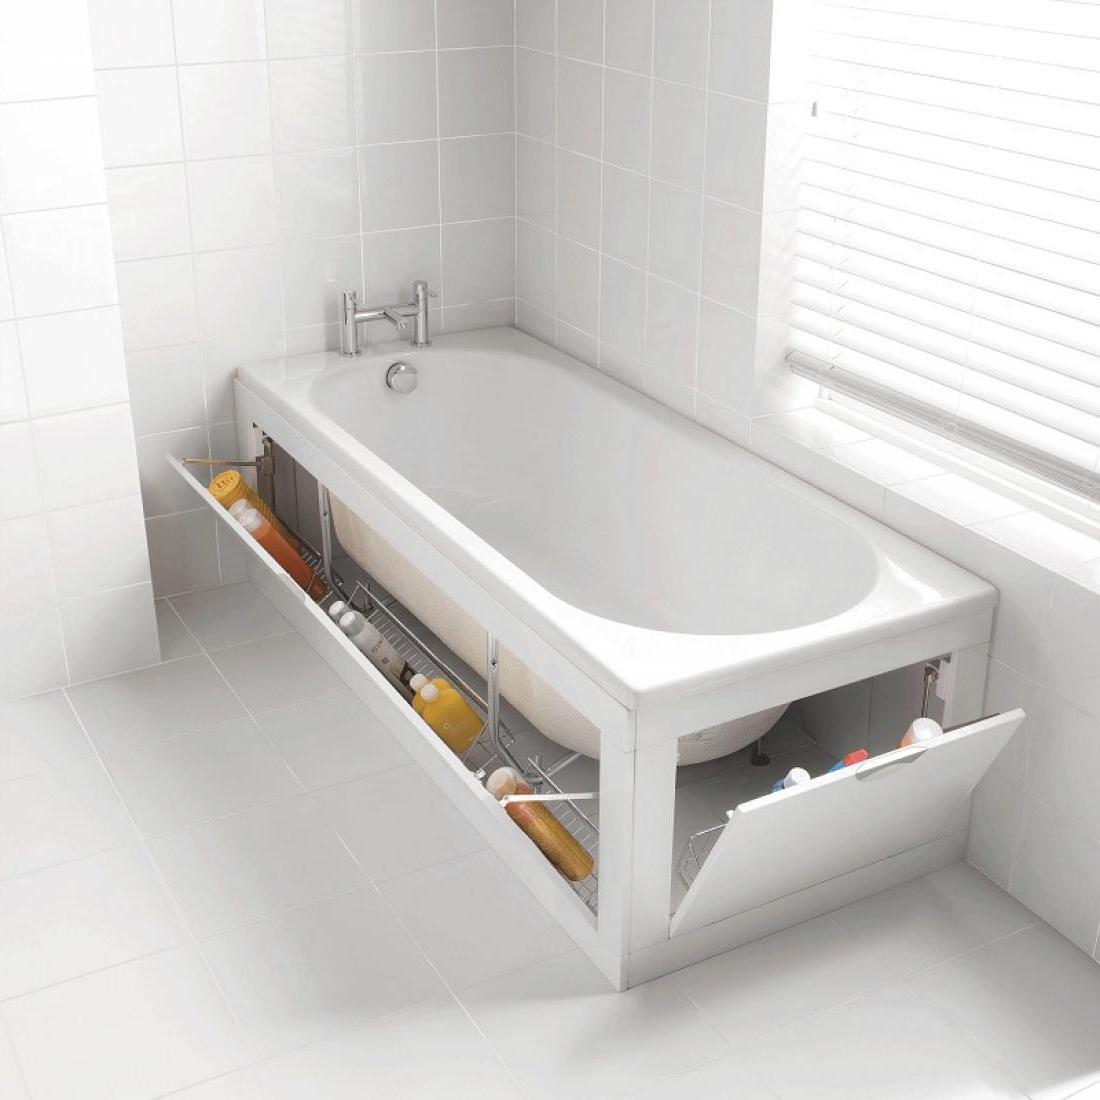 gorgeous-organizing-storage-under-bathtub-beside-window